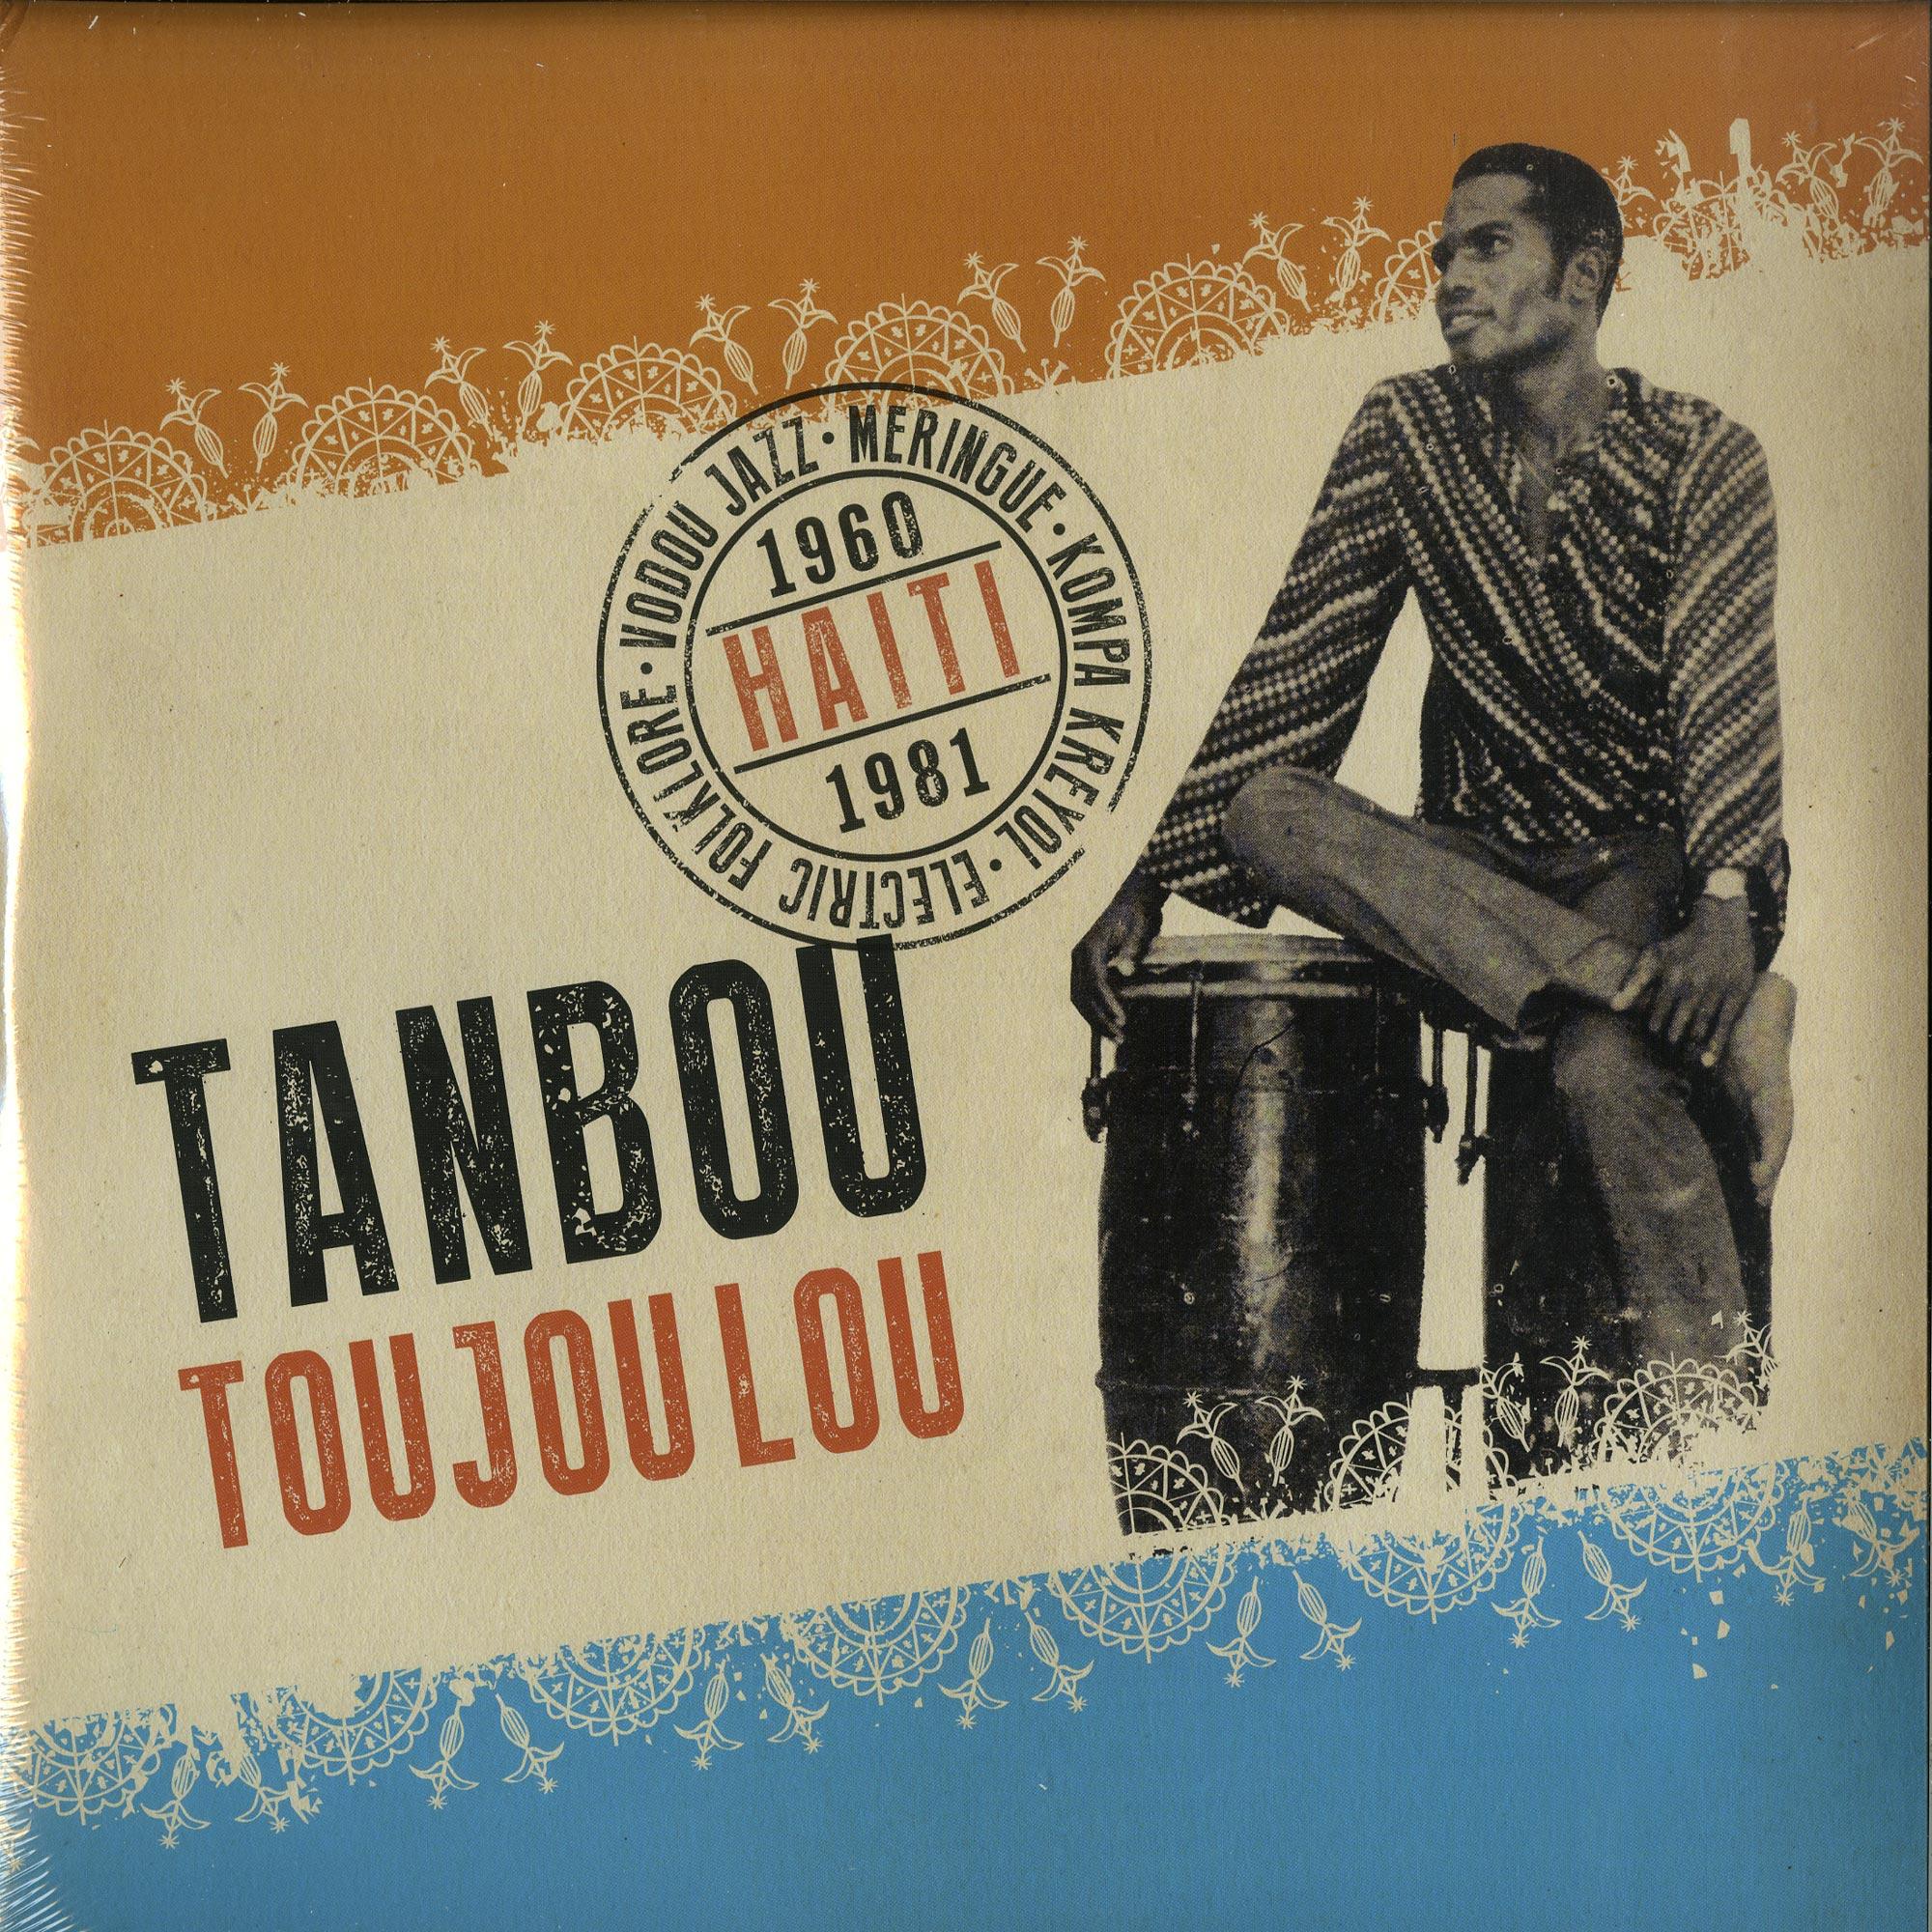 Various Artists - TANBOU TOUJOU LOU